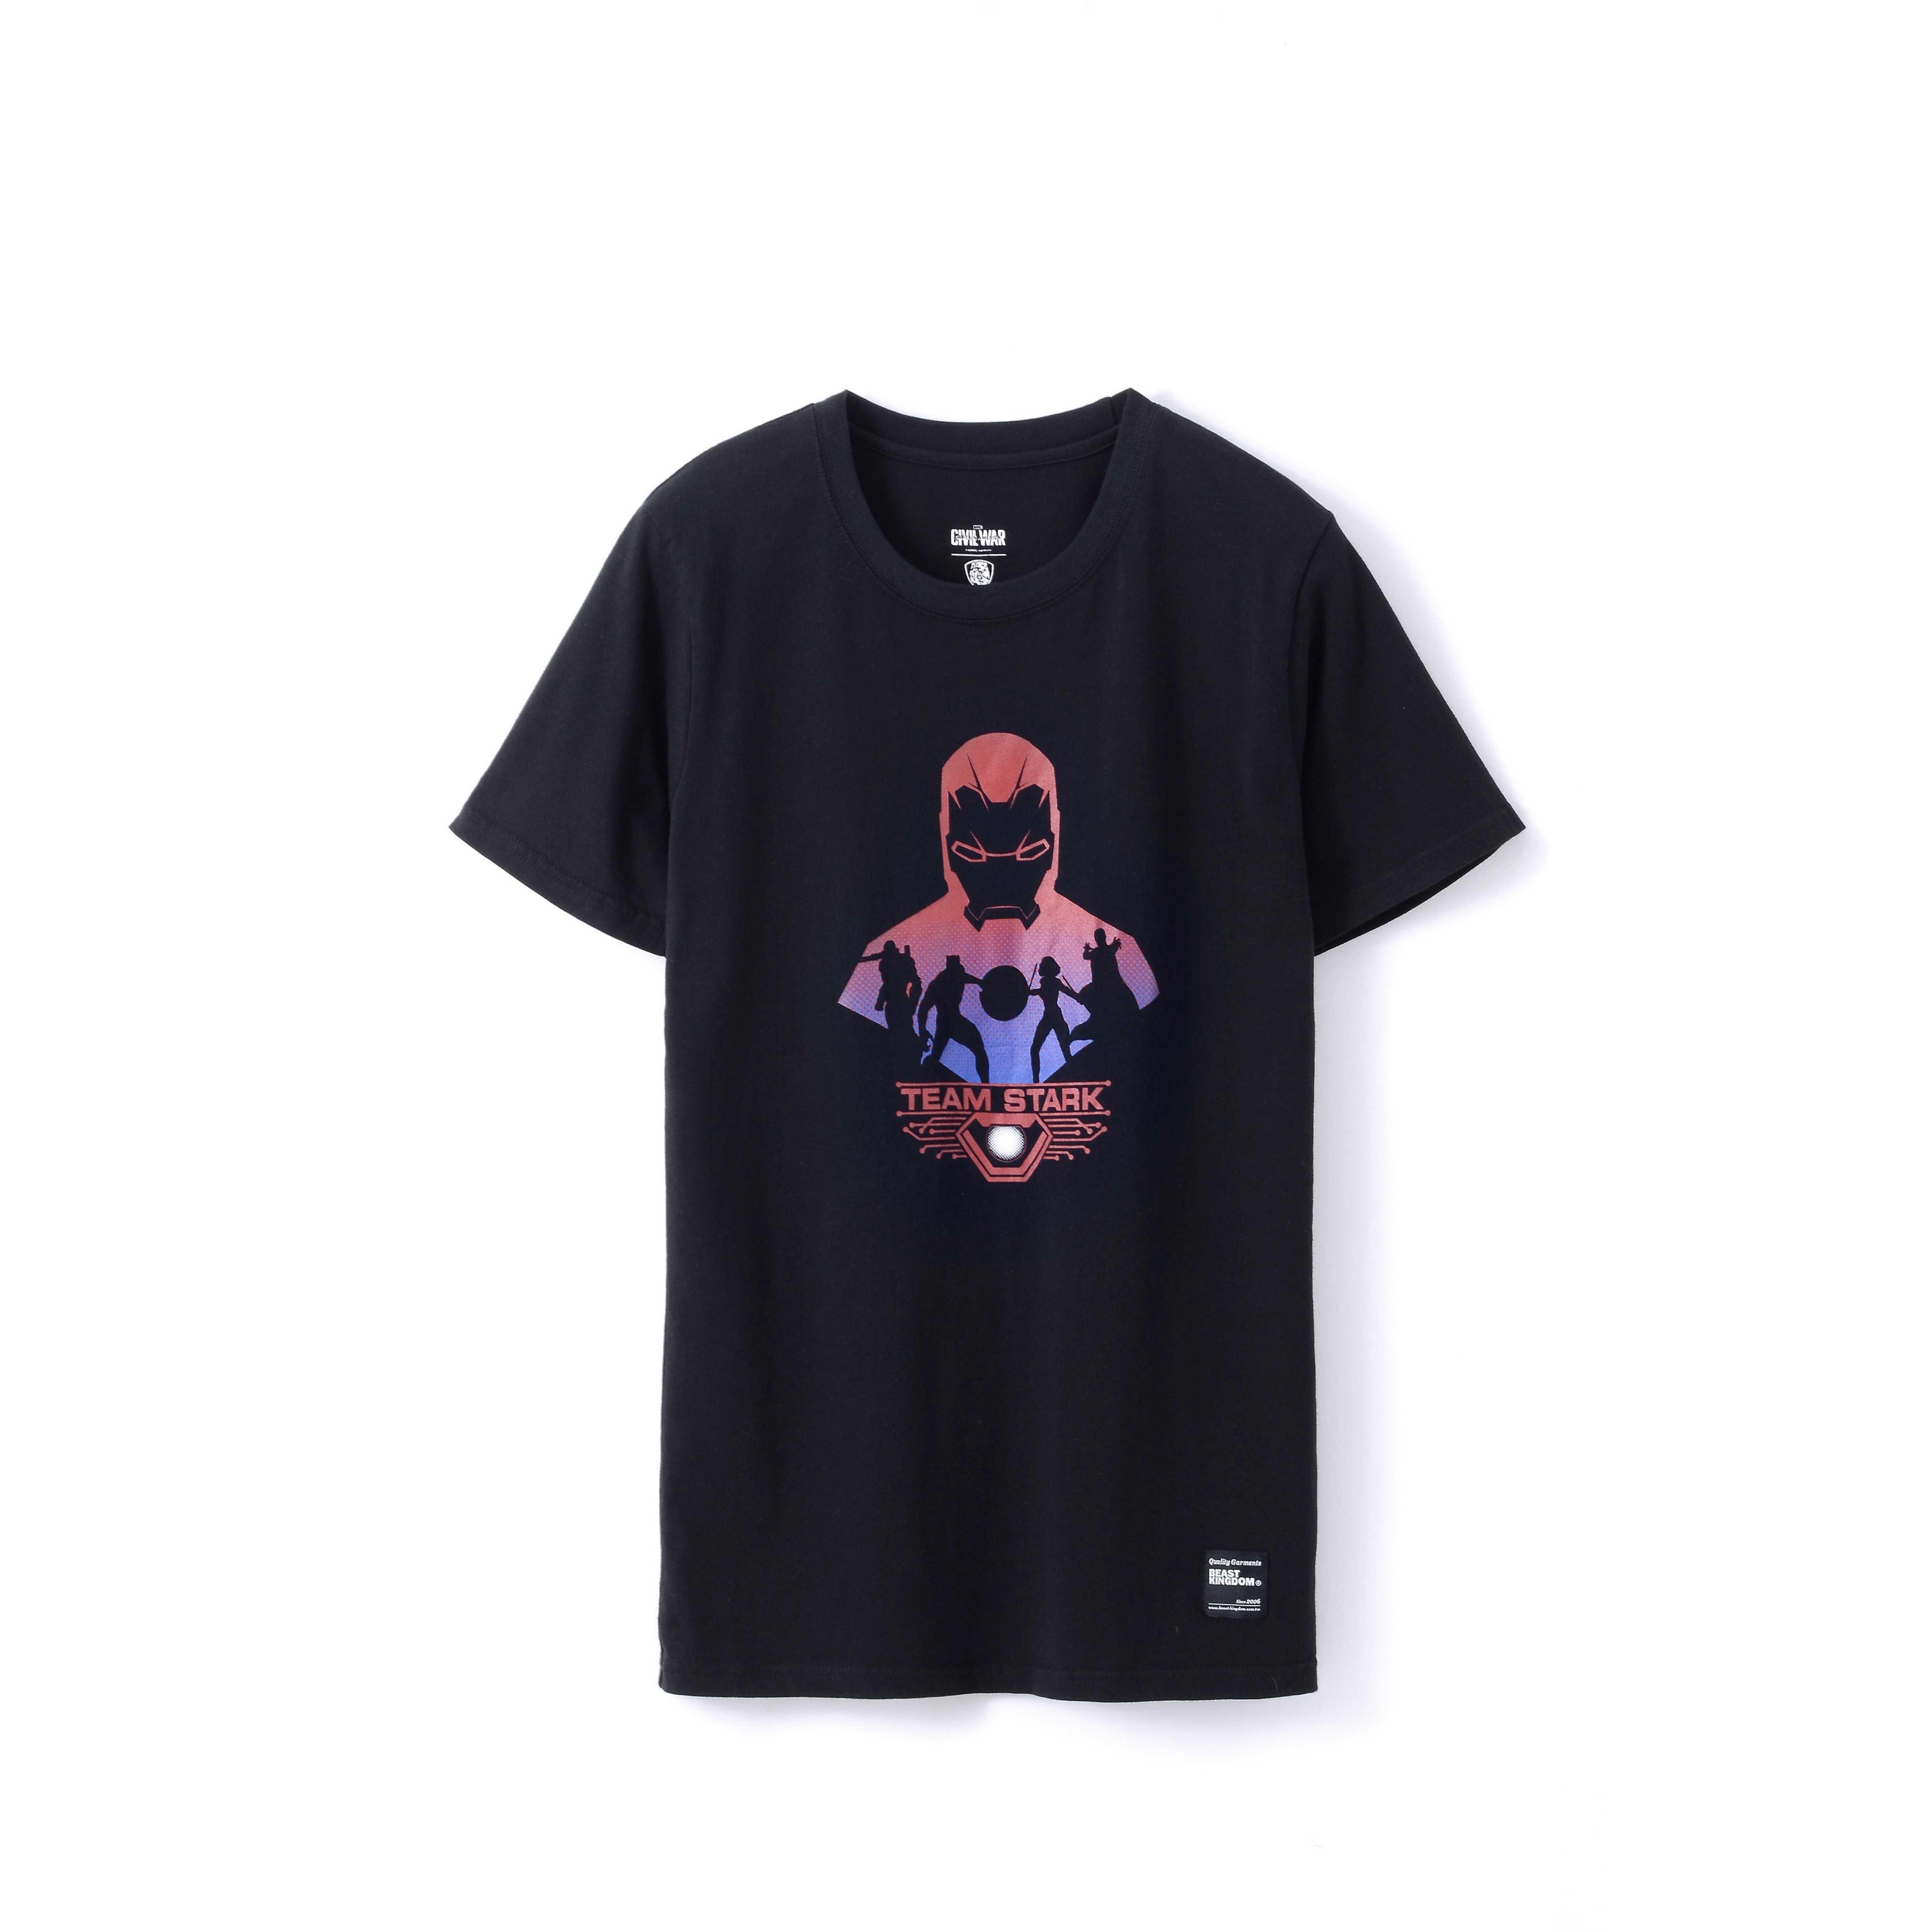 APL-CA3-012 美國隊長3 短袖T恤 012 Team Iron Man款(黑)